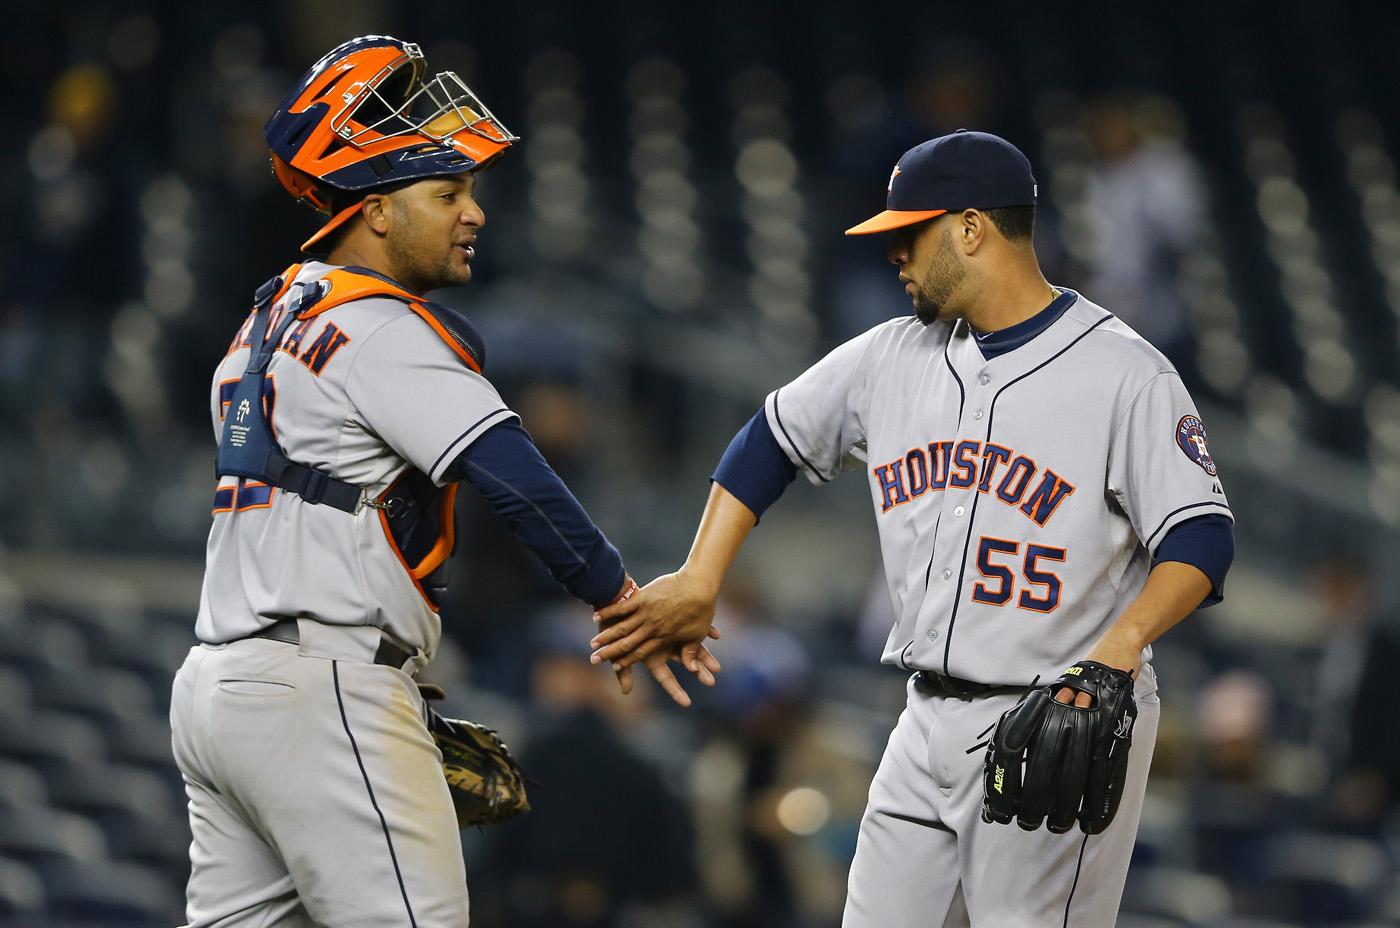 MLB_Astros_Yankees_April29_Astros2.jpg